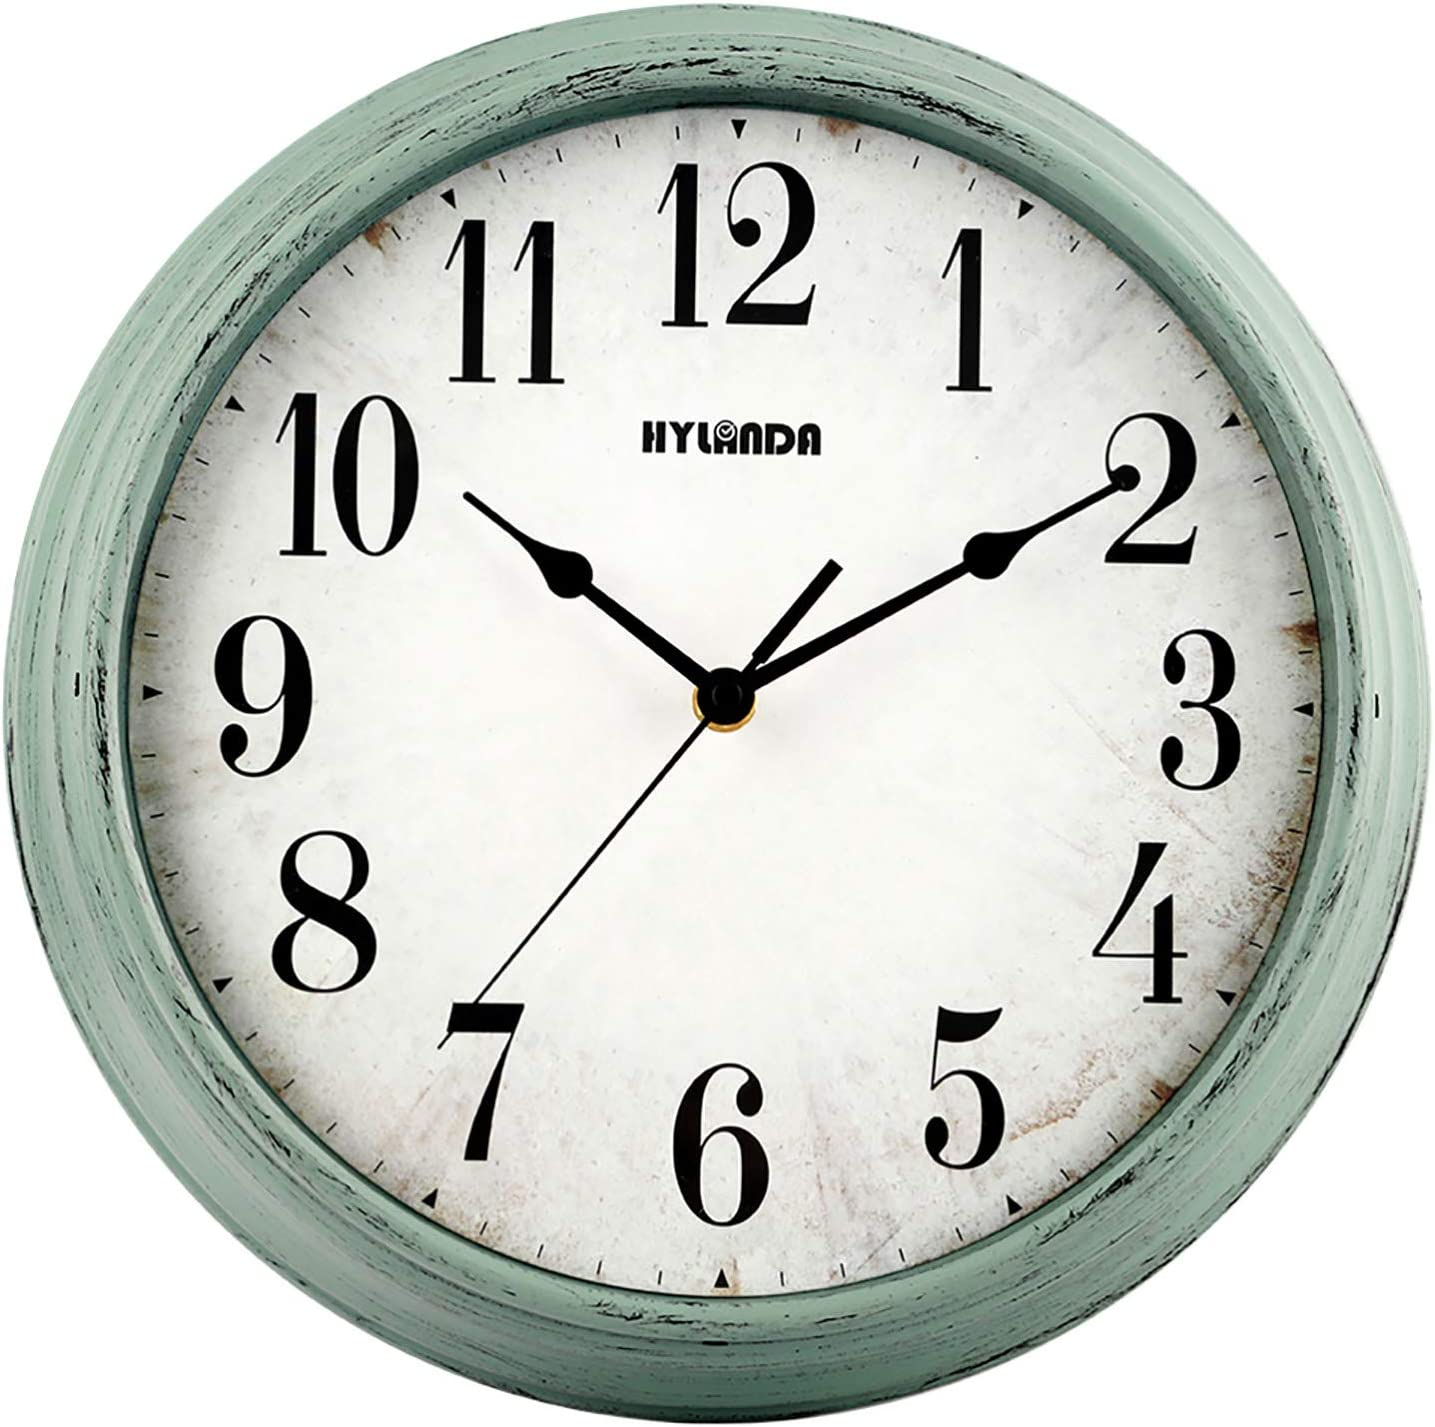 HYLANDA Wall Clock Silent Non Ticking, 12 Inch Vintage Retro Wall Clocks Battery Operated Decorative Easy to Read Kitchen Home Living Room Office Bathroom(Aqua)